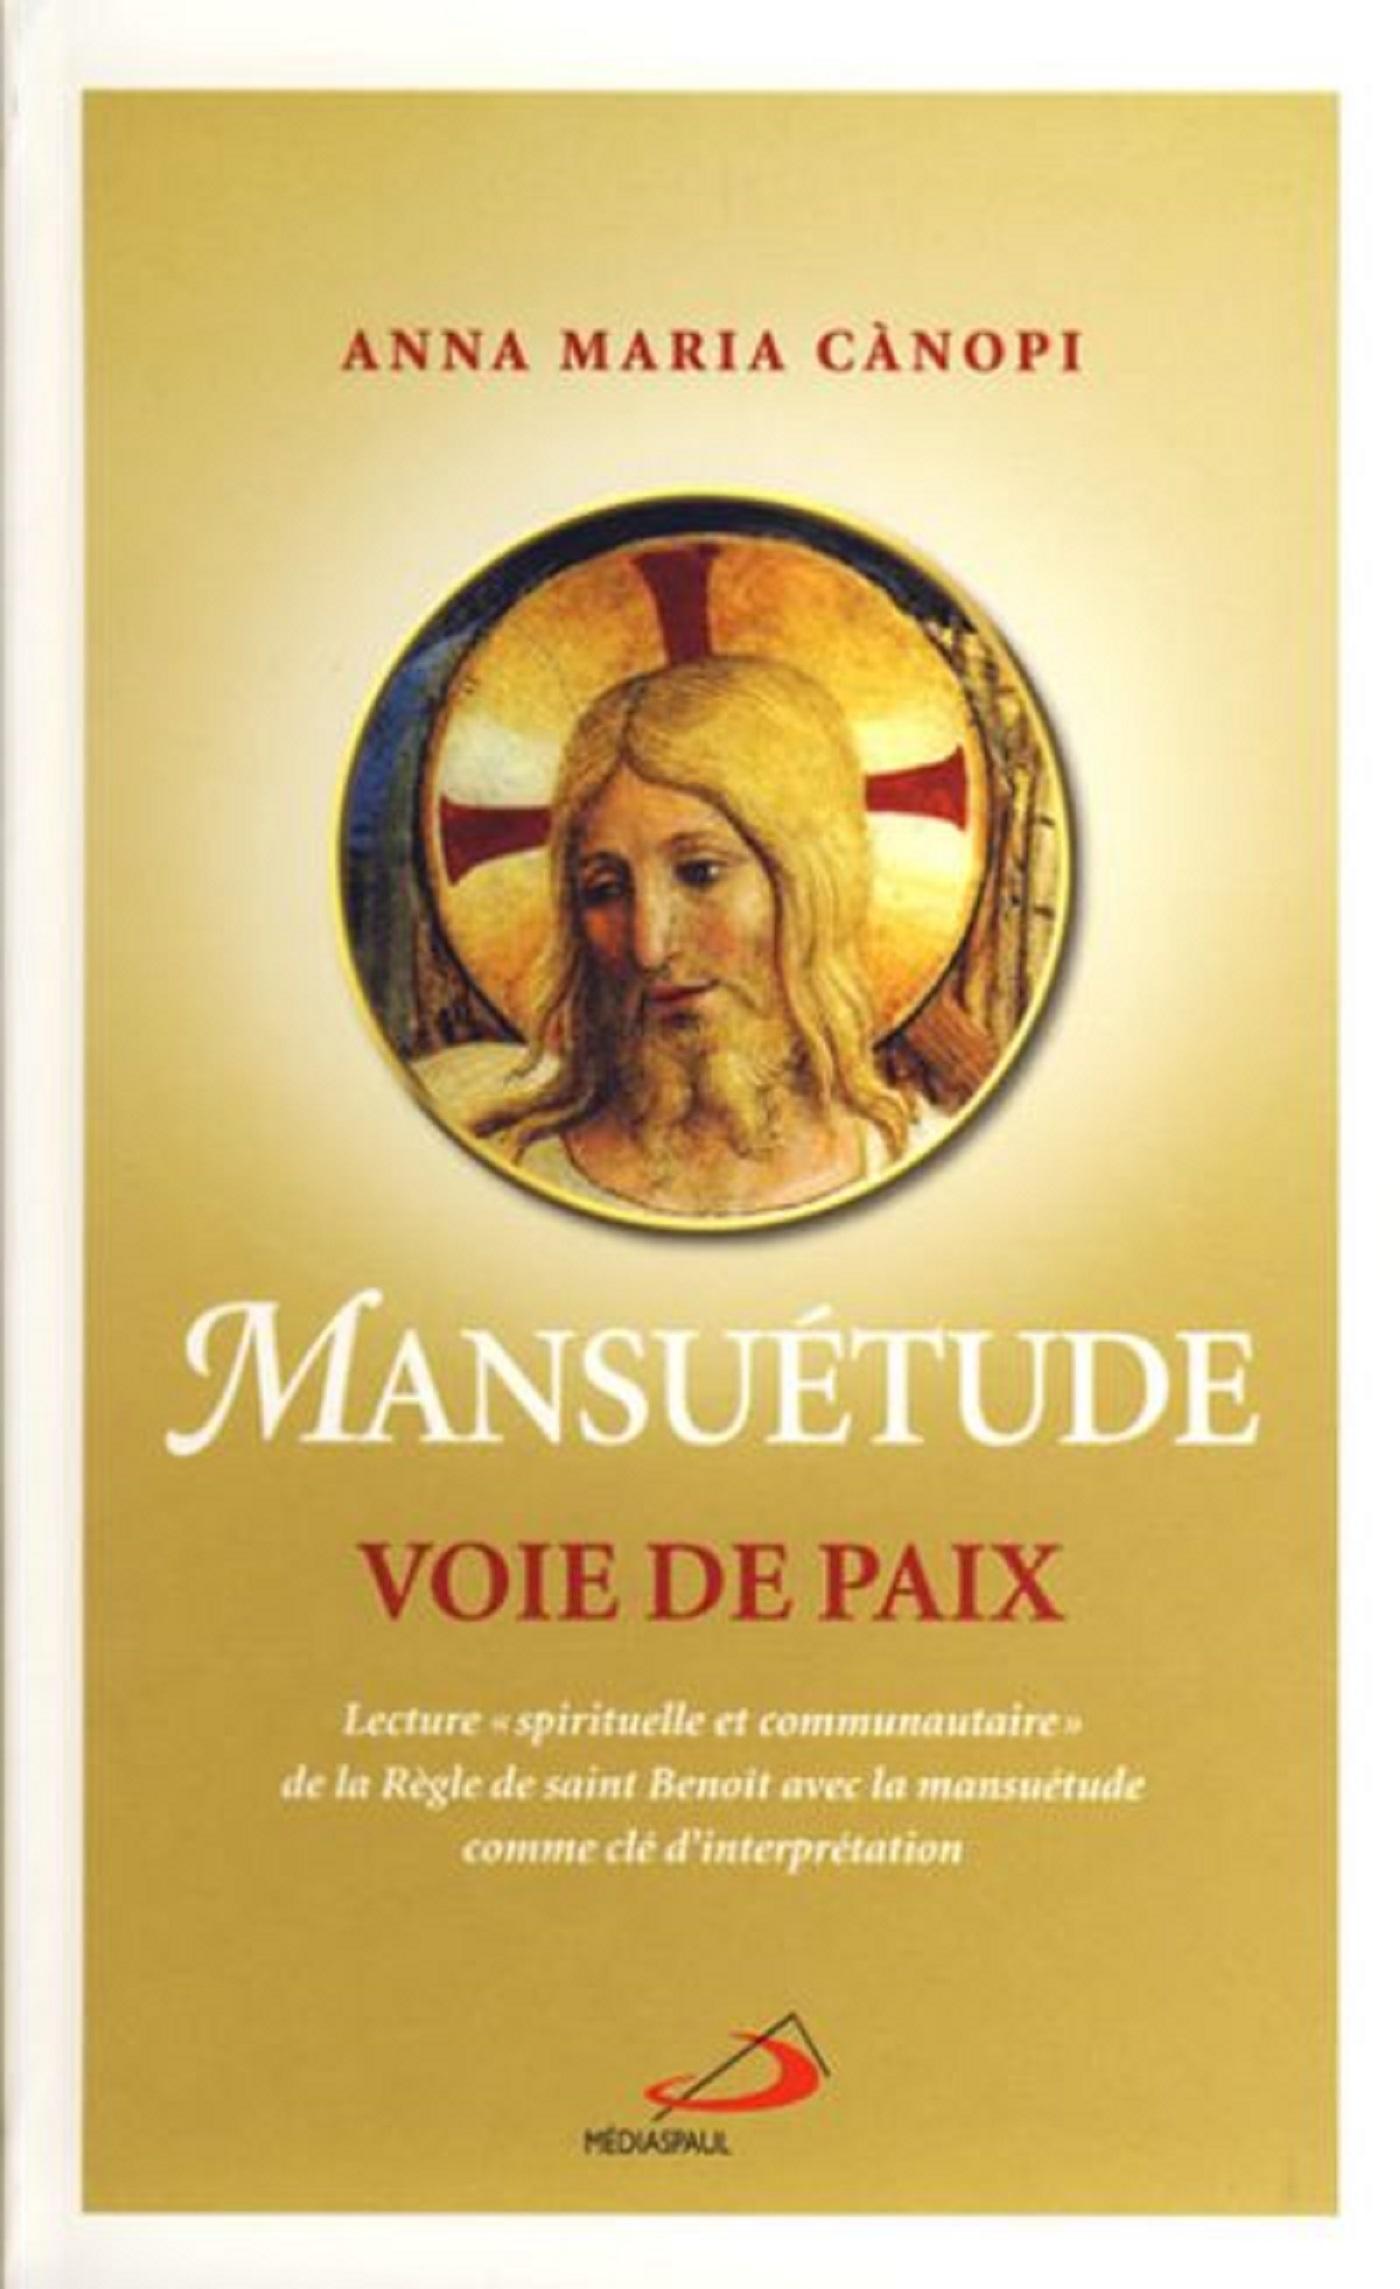 MANSUETUDE  VOIE DE PAIX